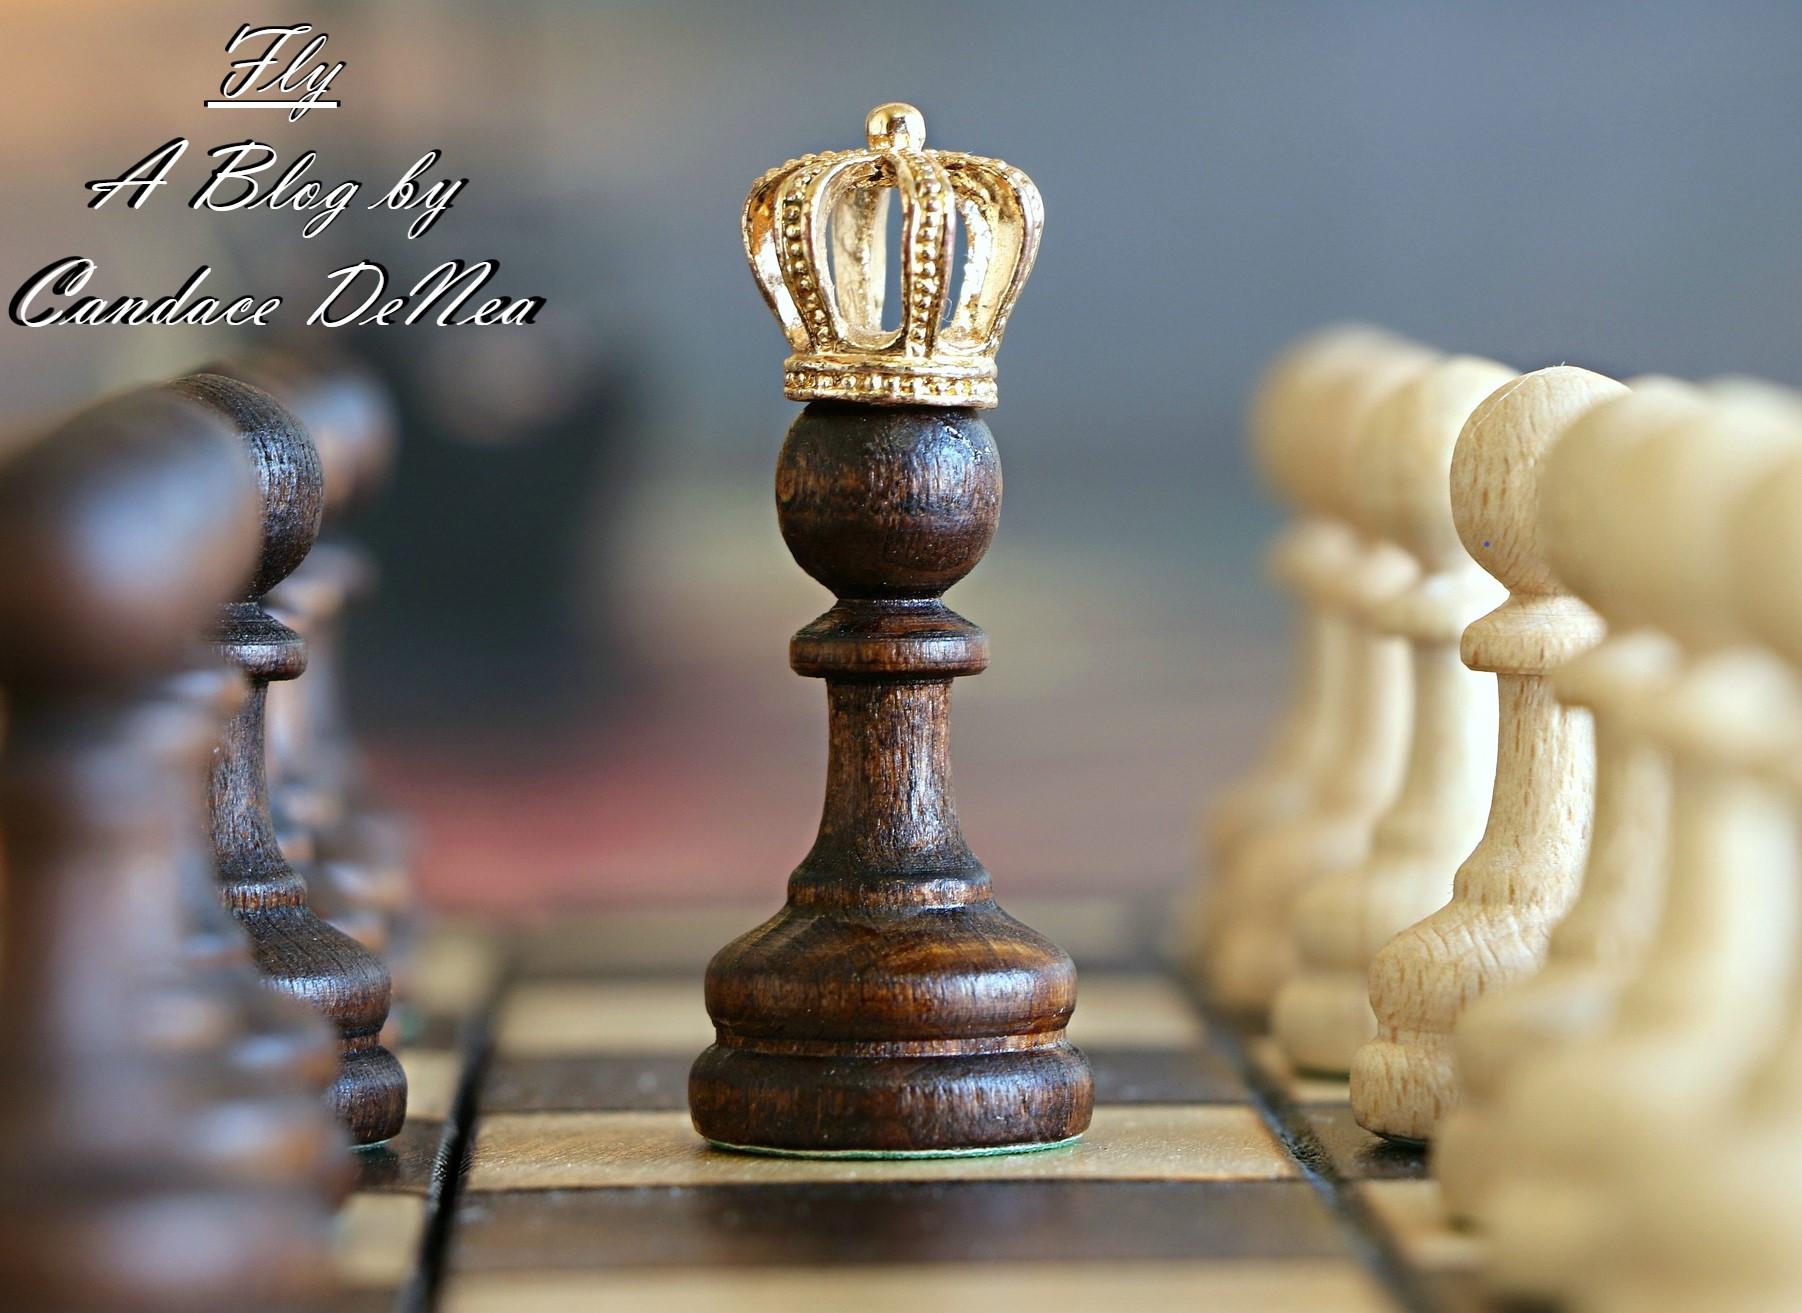 chess-1483735_1920 text.jpg